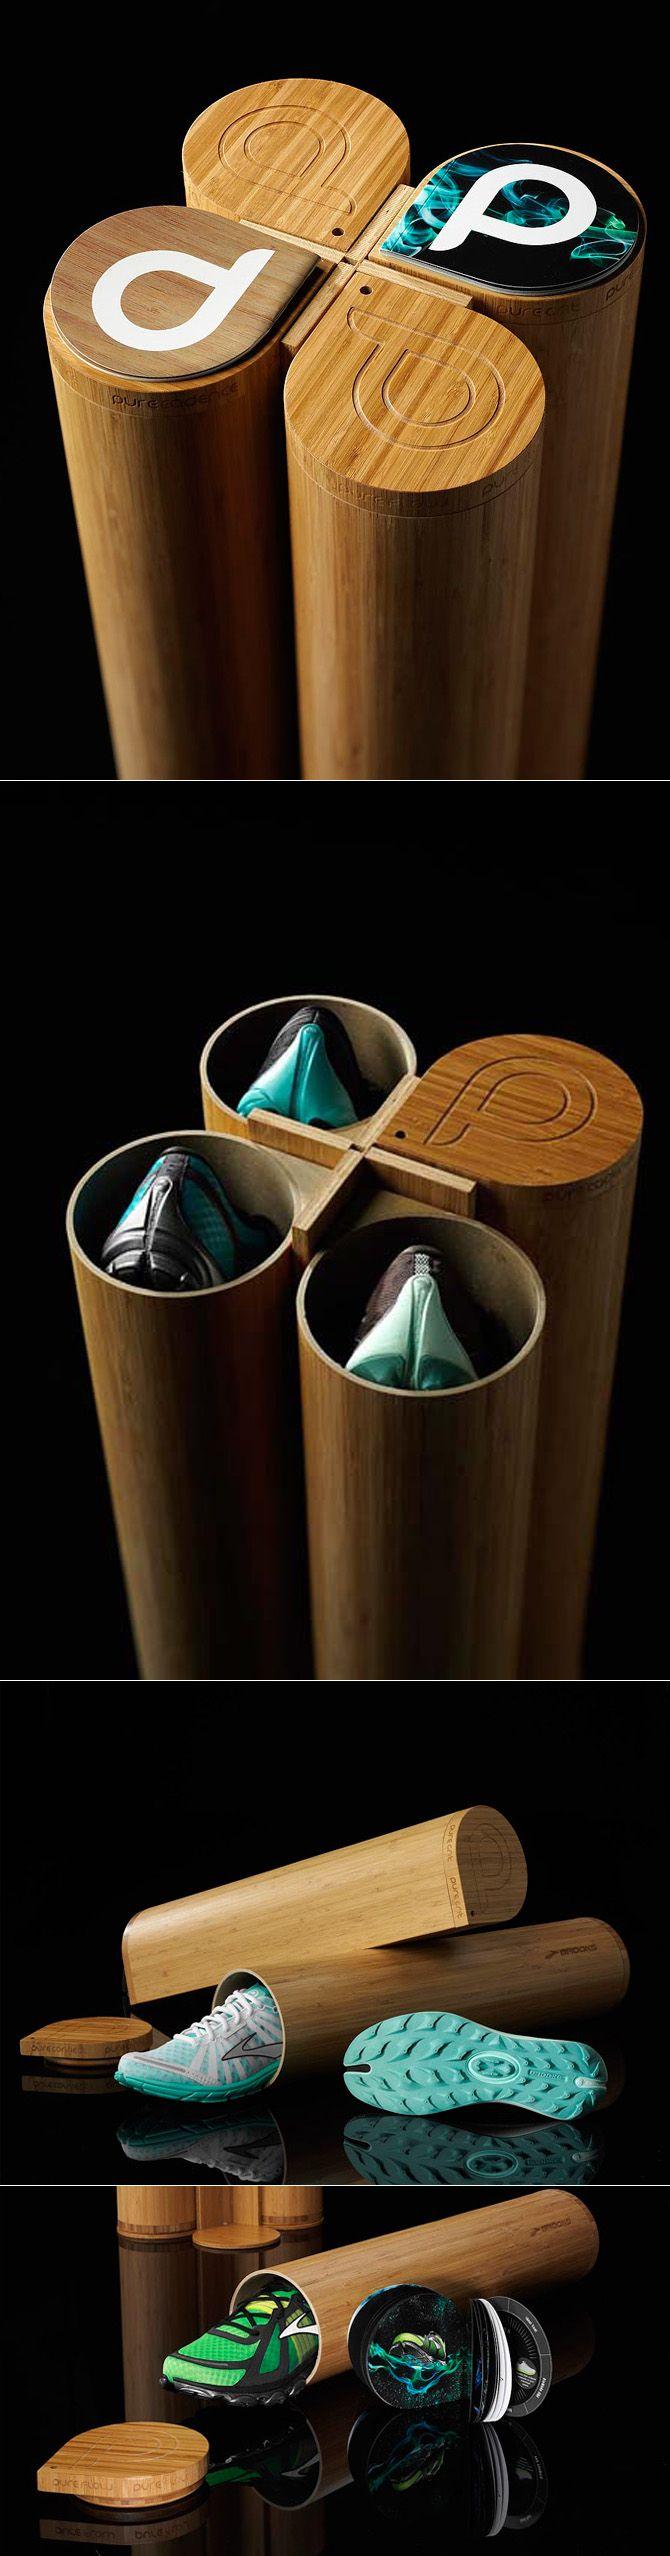 """Cool Packaging Designs Of Shoes - We Design Packaging"""